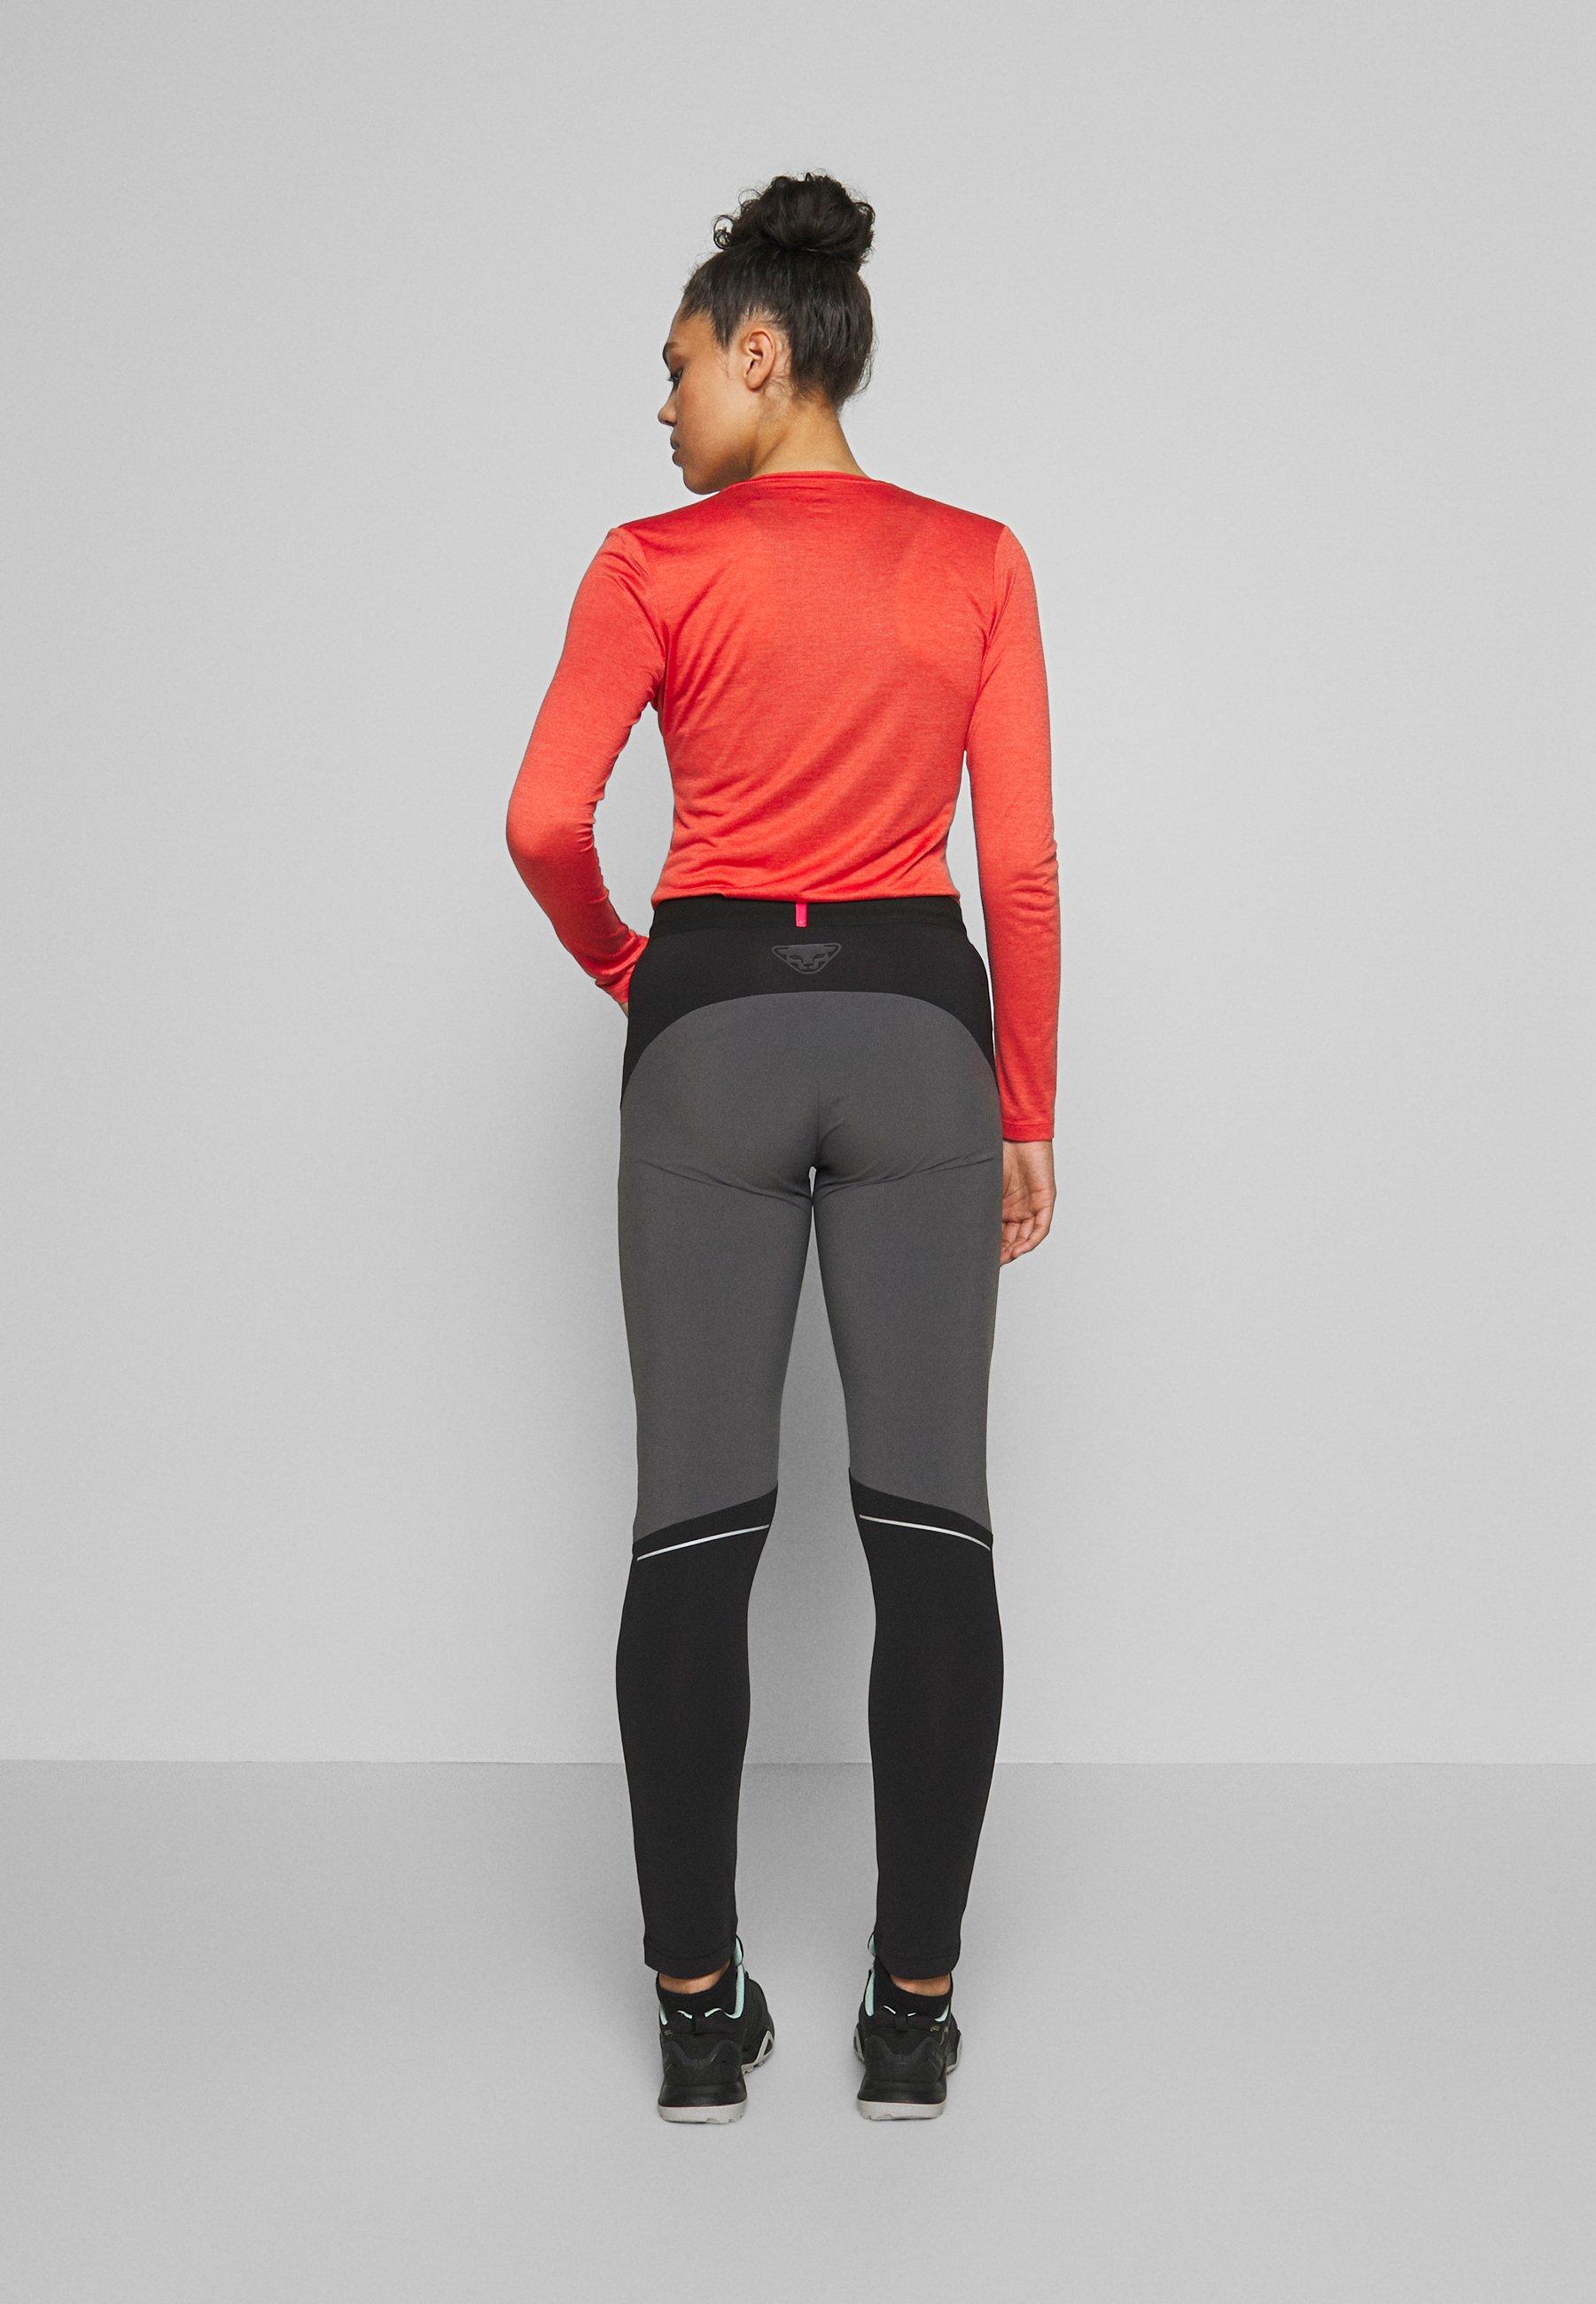 ADIDAS PERFORMANCE Jogginghose in rosegold dunkelgrau